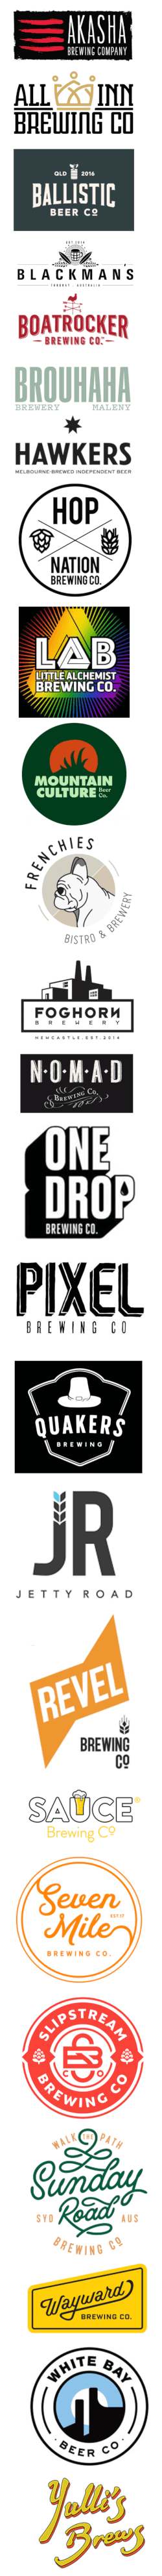 2020 Beer Advent Calendar Breweries